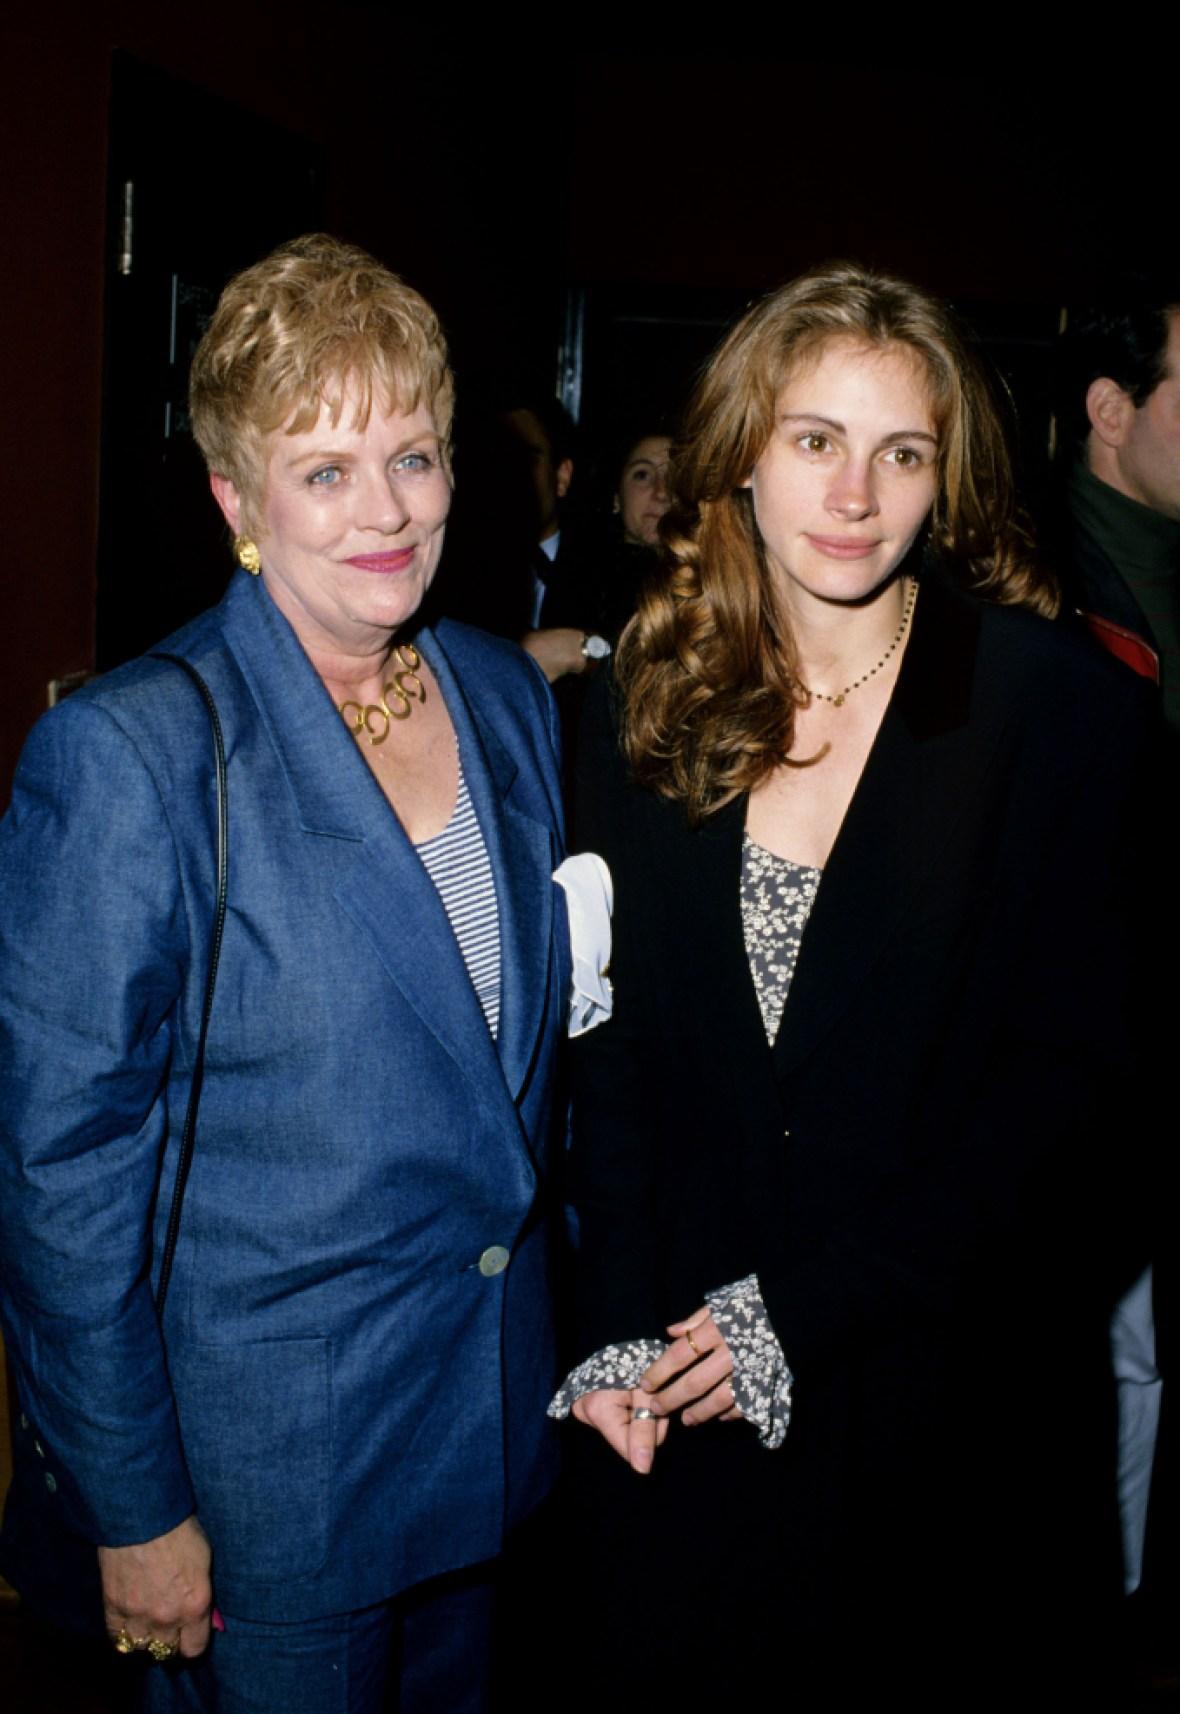 julia roberts' mother